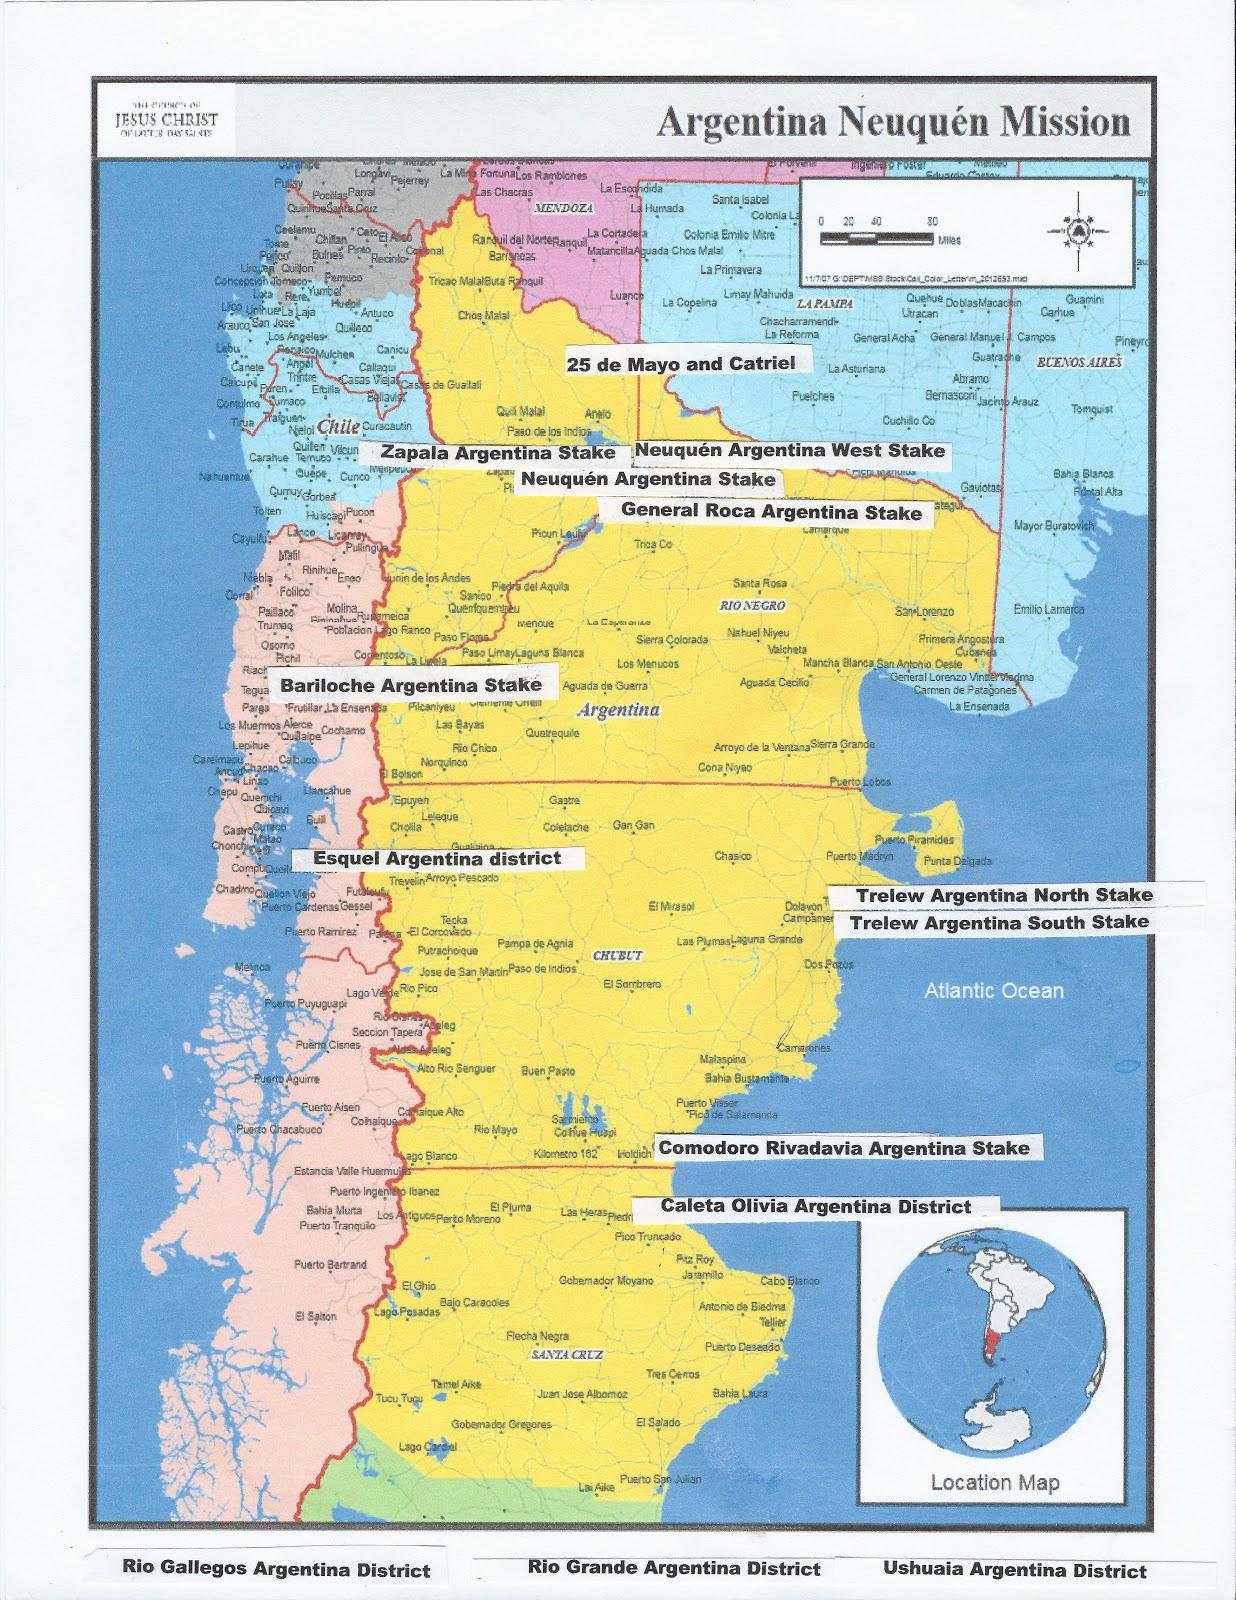 Lovells In Argentina Argentina Neuquen Mission - Zapala argentina map